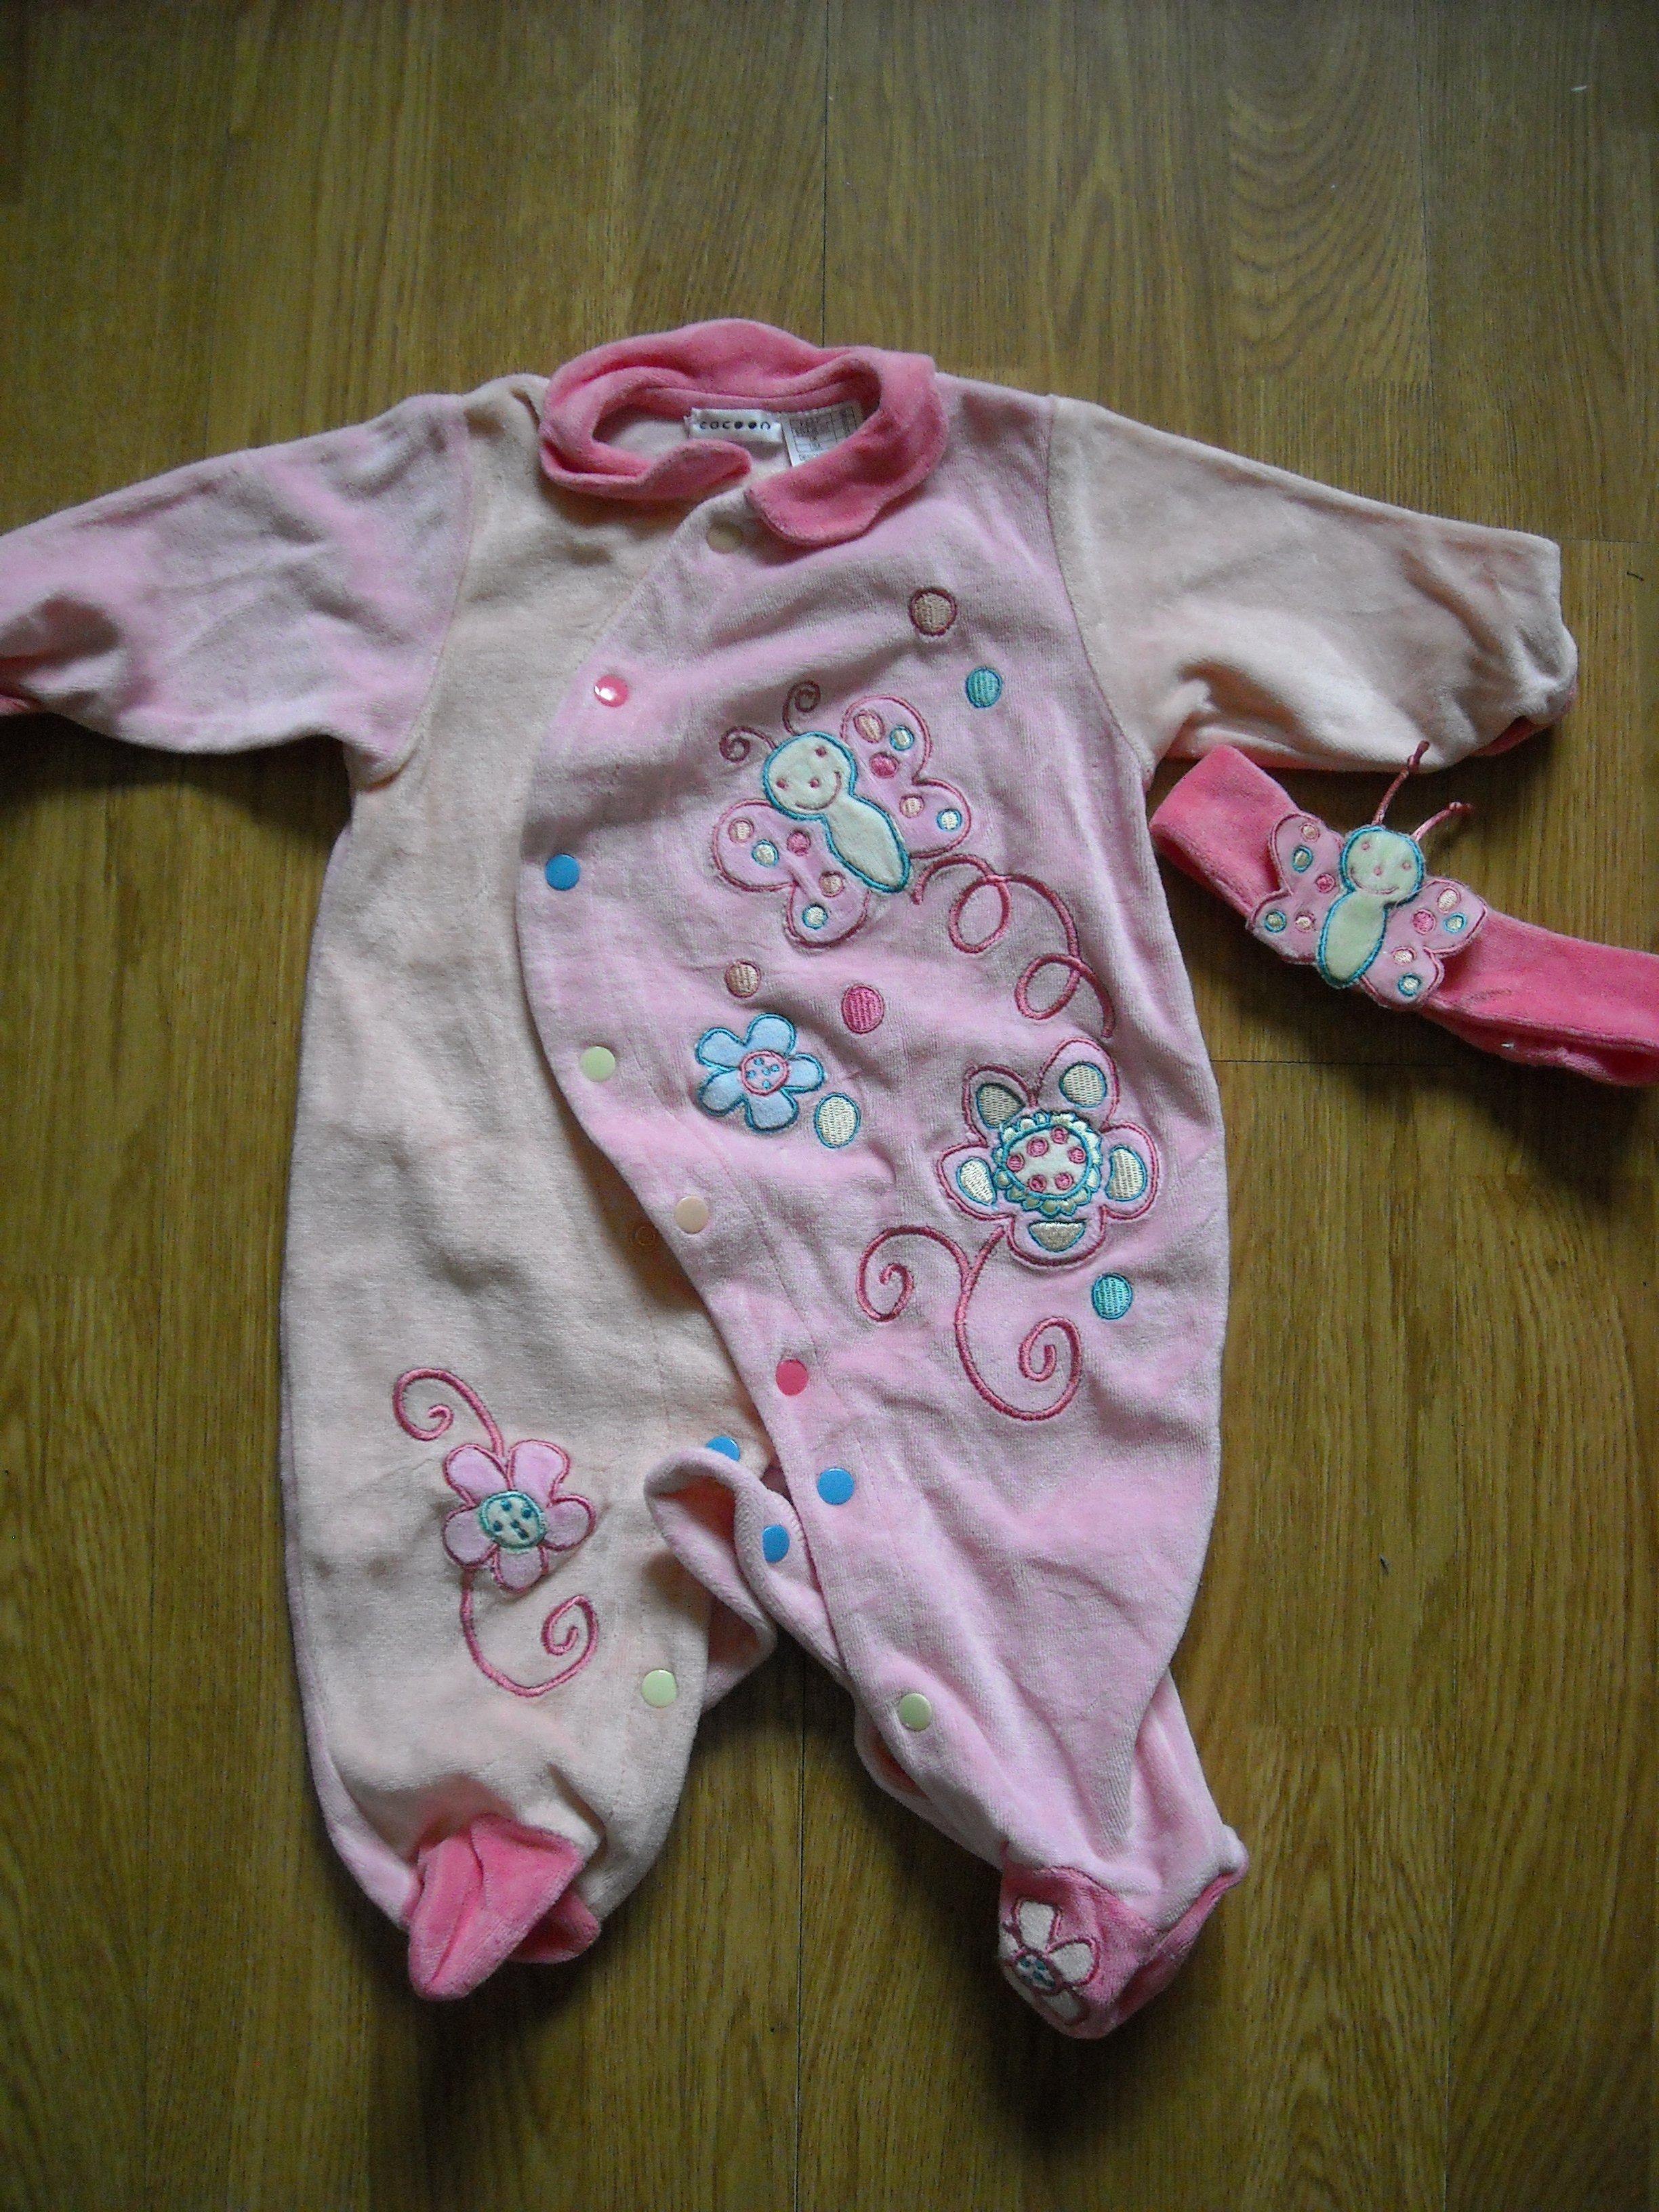 pyjama bebe avec son bandeau en mois cocooon vetements fille 3 mois theolou62 photos. Black Bedroom Furniture Sets. Home Design Ideas